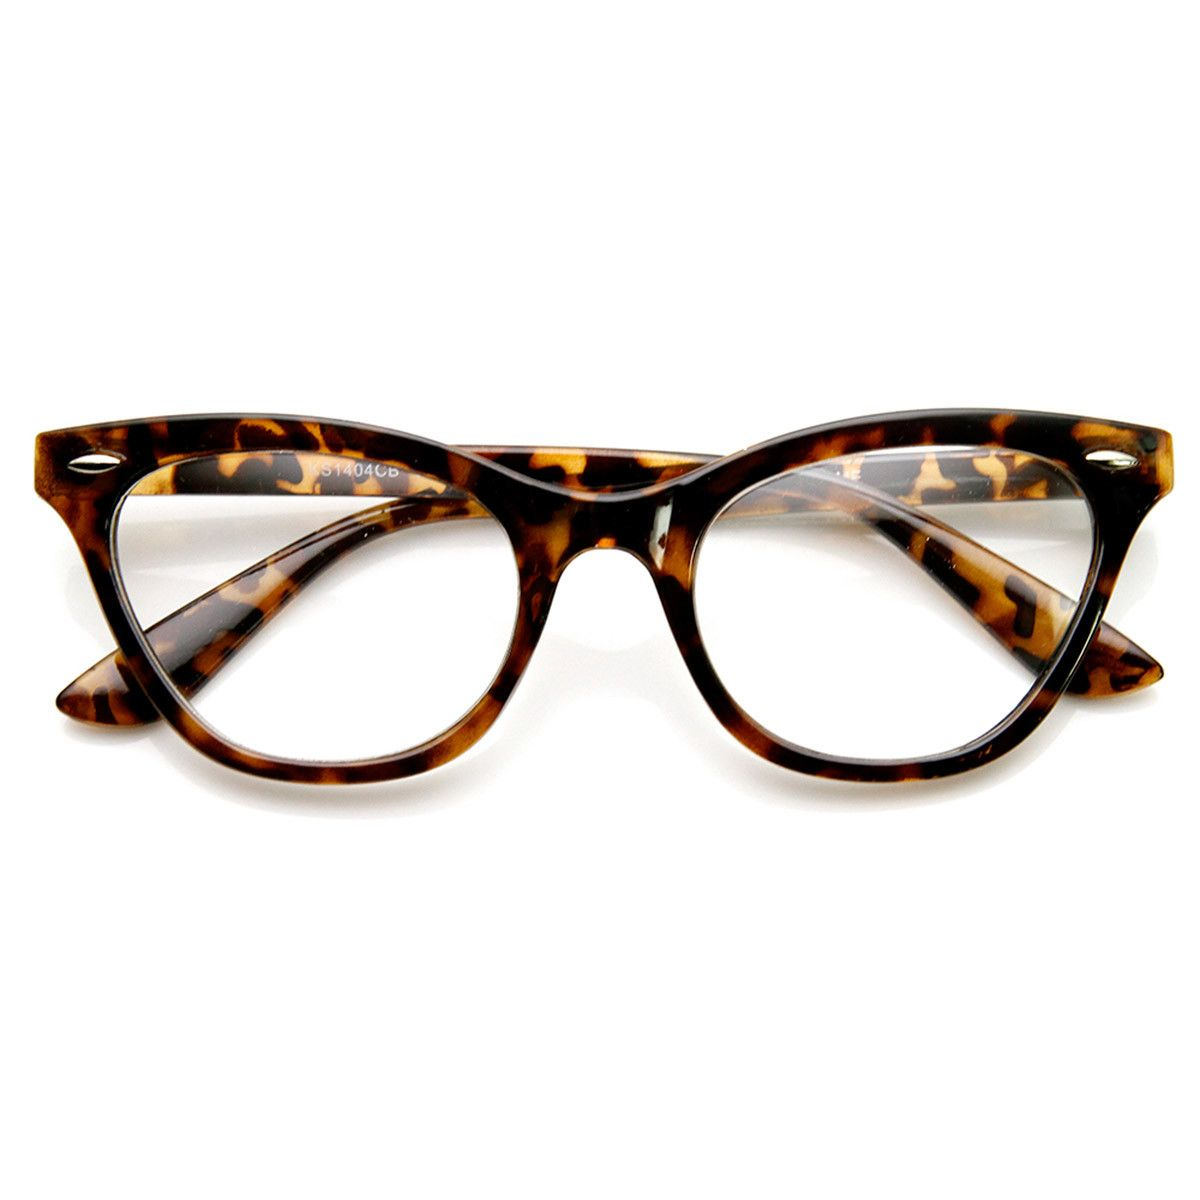 Womens Eyewear Fashion 60s Era Clear Lens Cat Eye Glasses